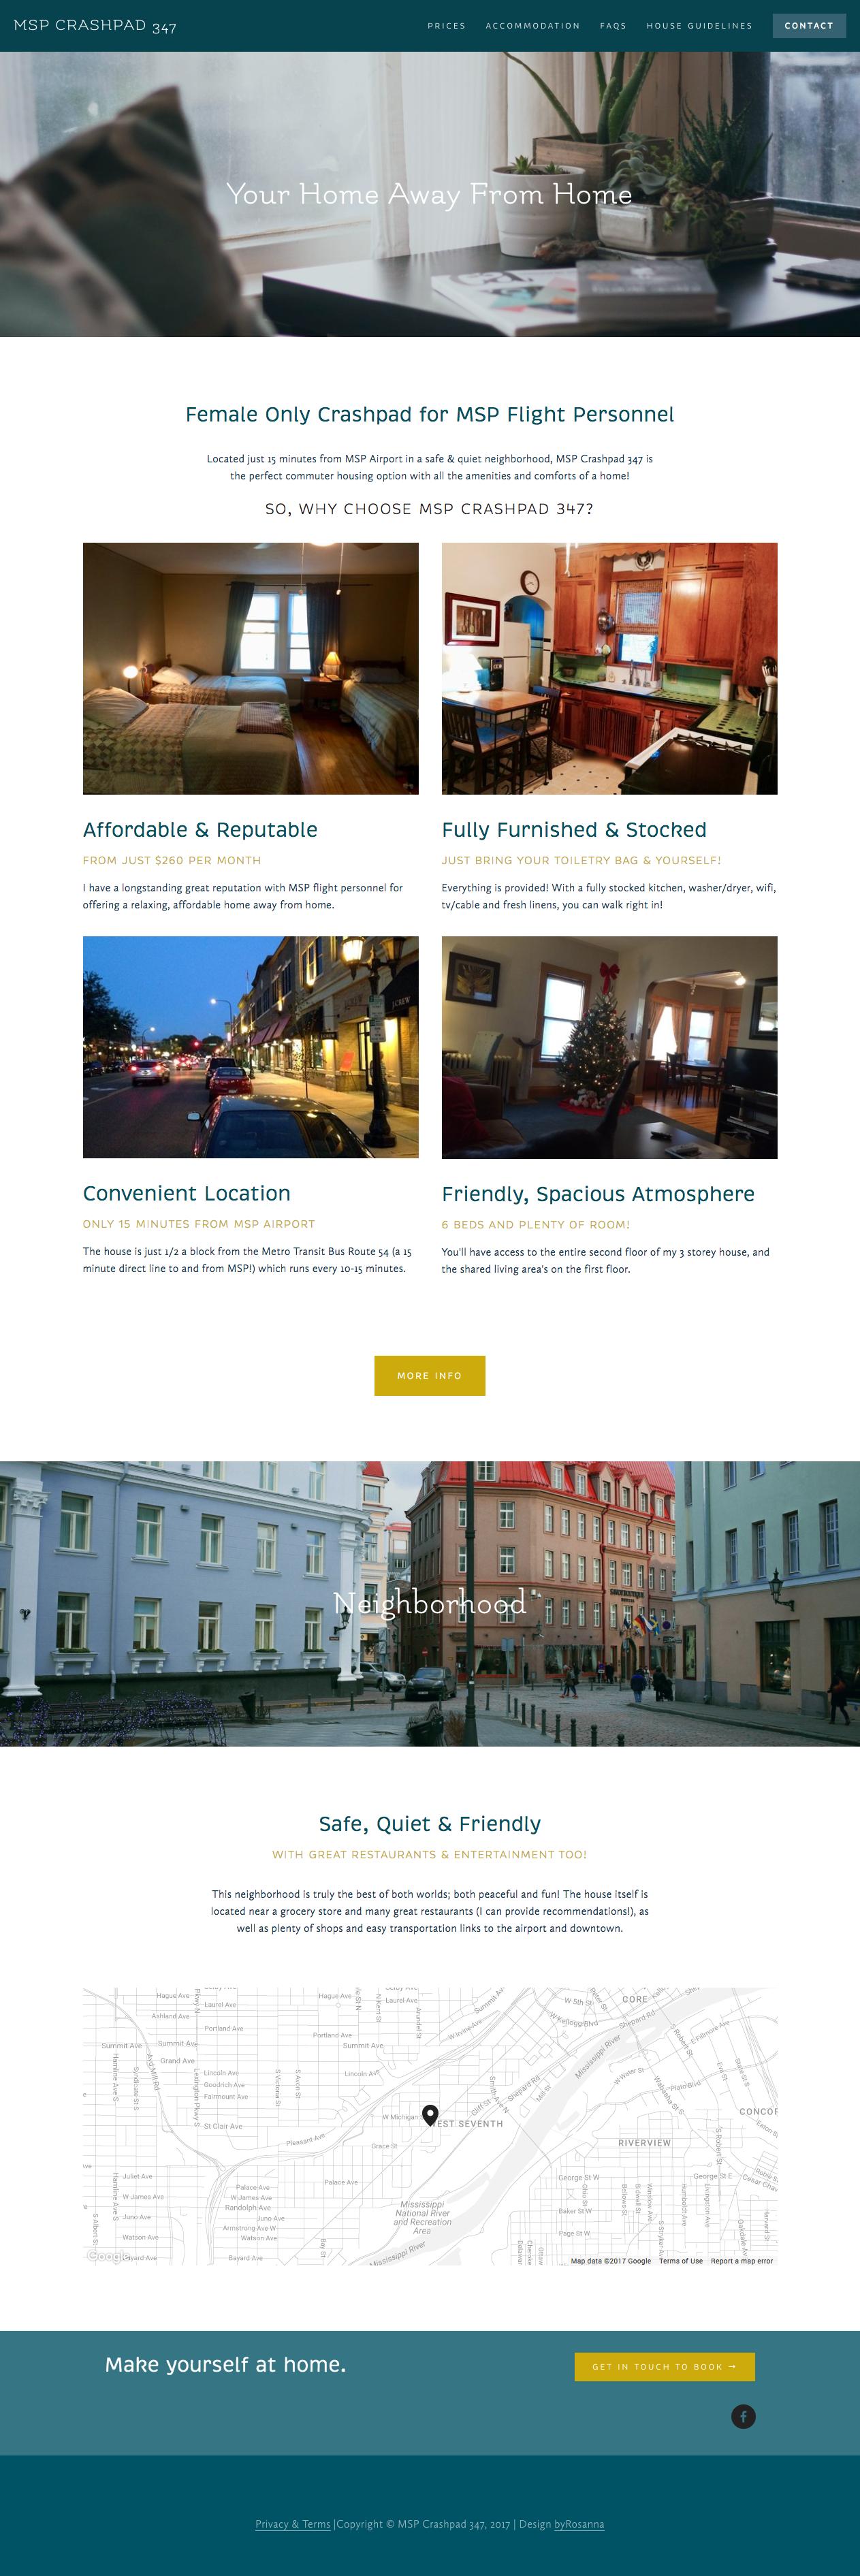 Simple, modern website design for MSP Crashpad 347 | byRosanna